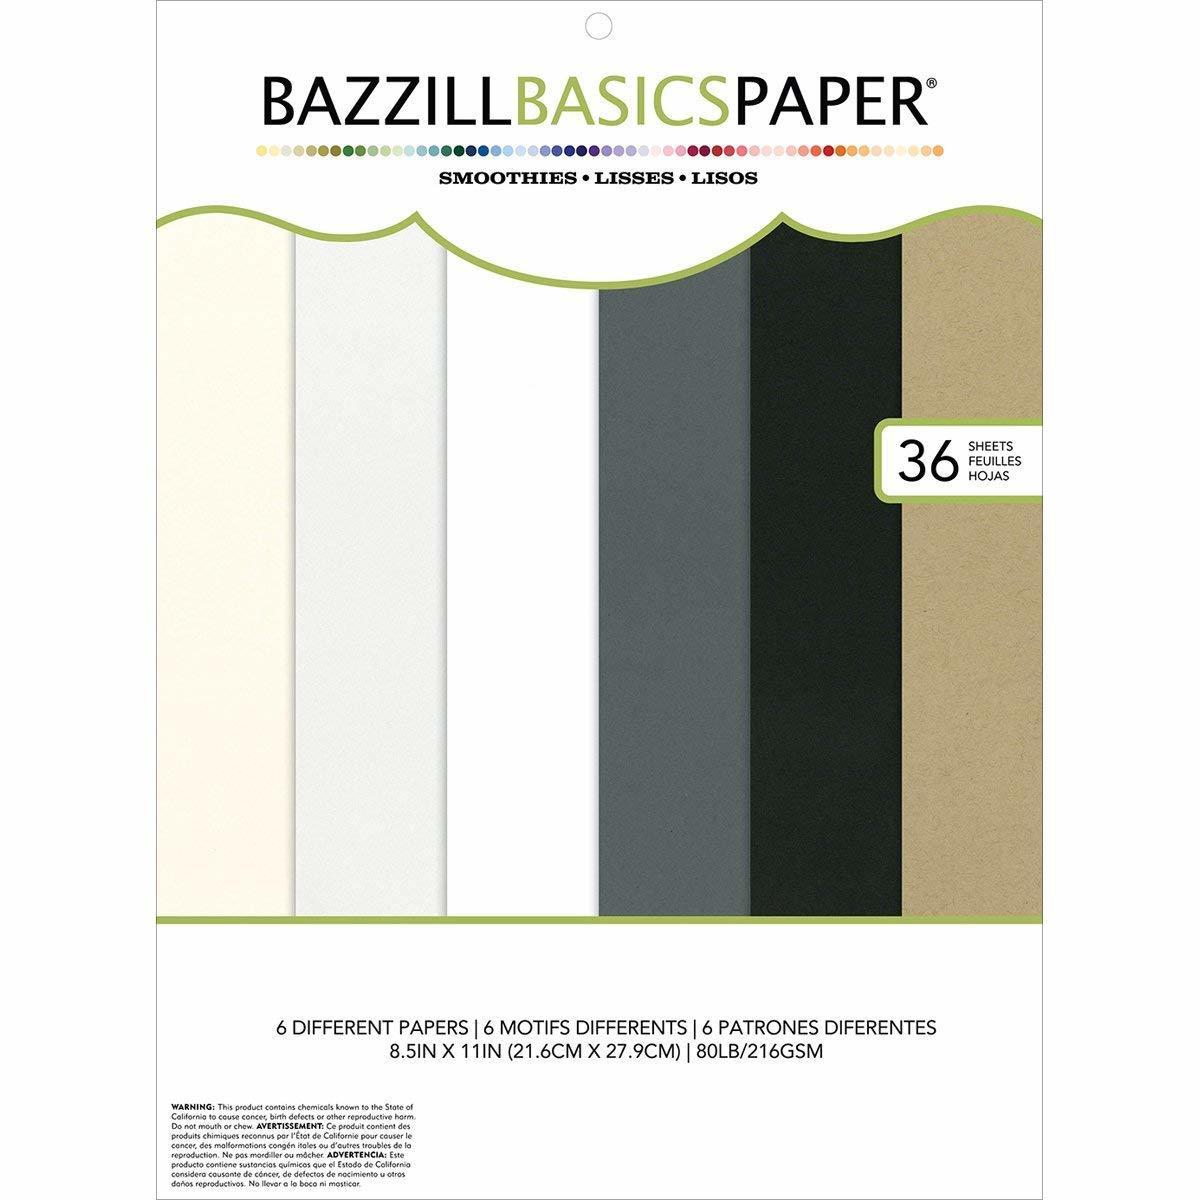 American Crafts Bazzill Basics Paper Cardstock